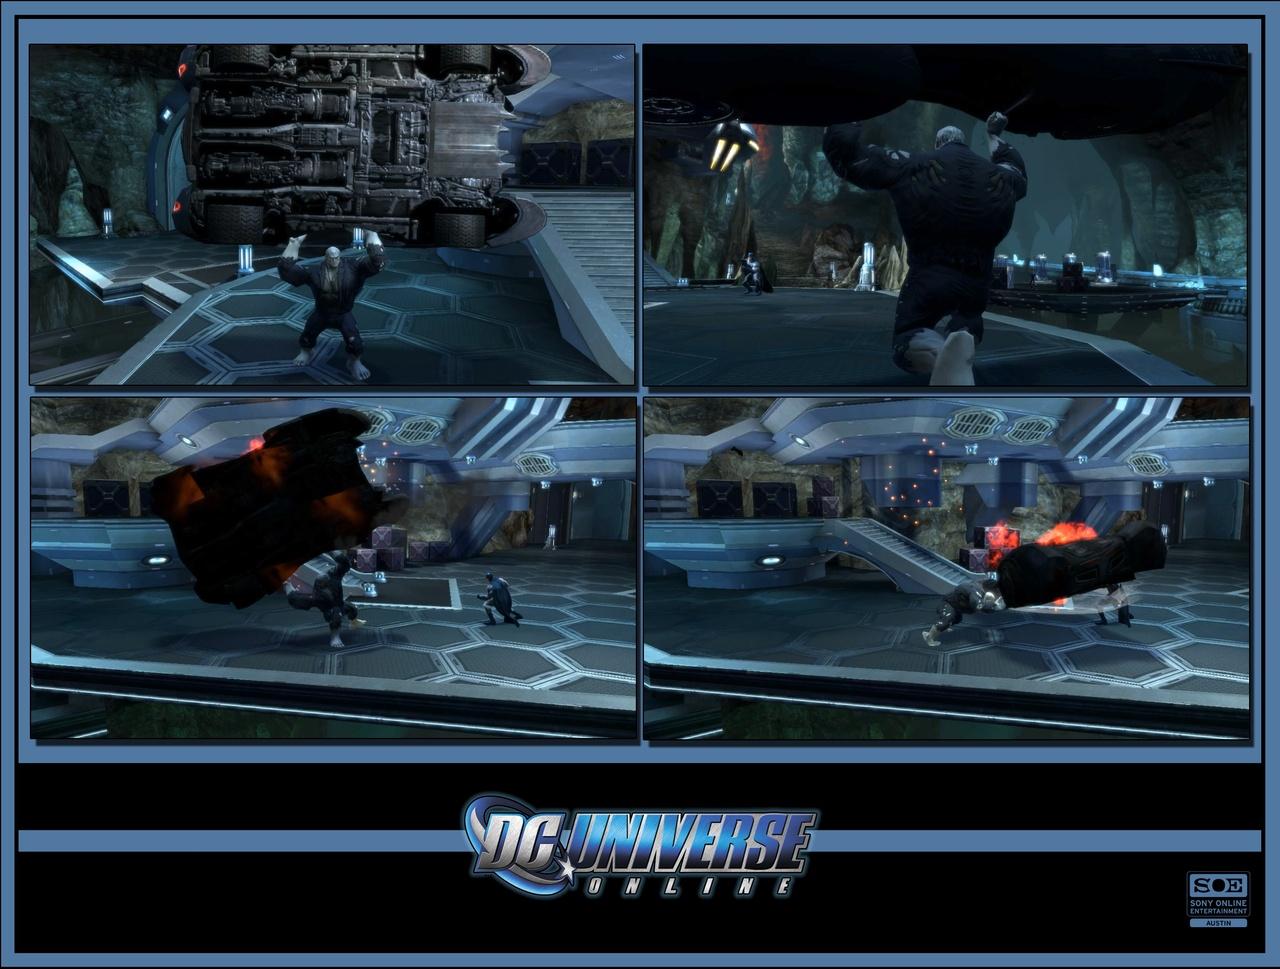 Batmobile Dc Universe Online Wiki Fandom Powered By Wikia